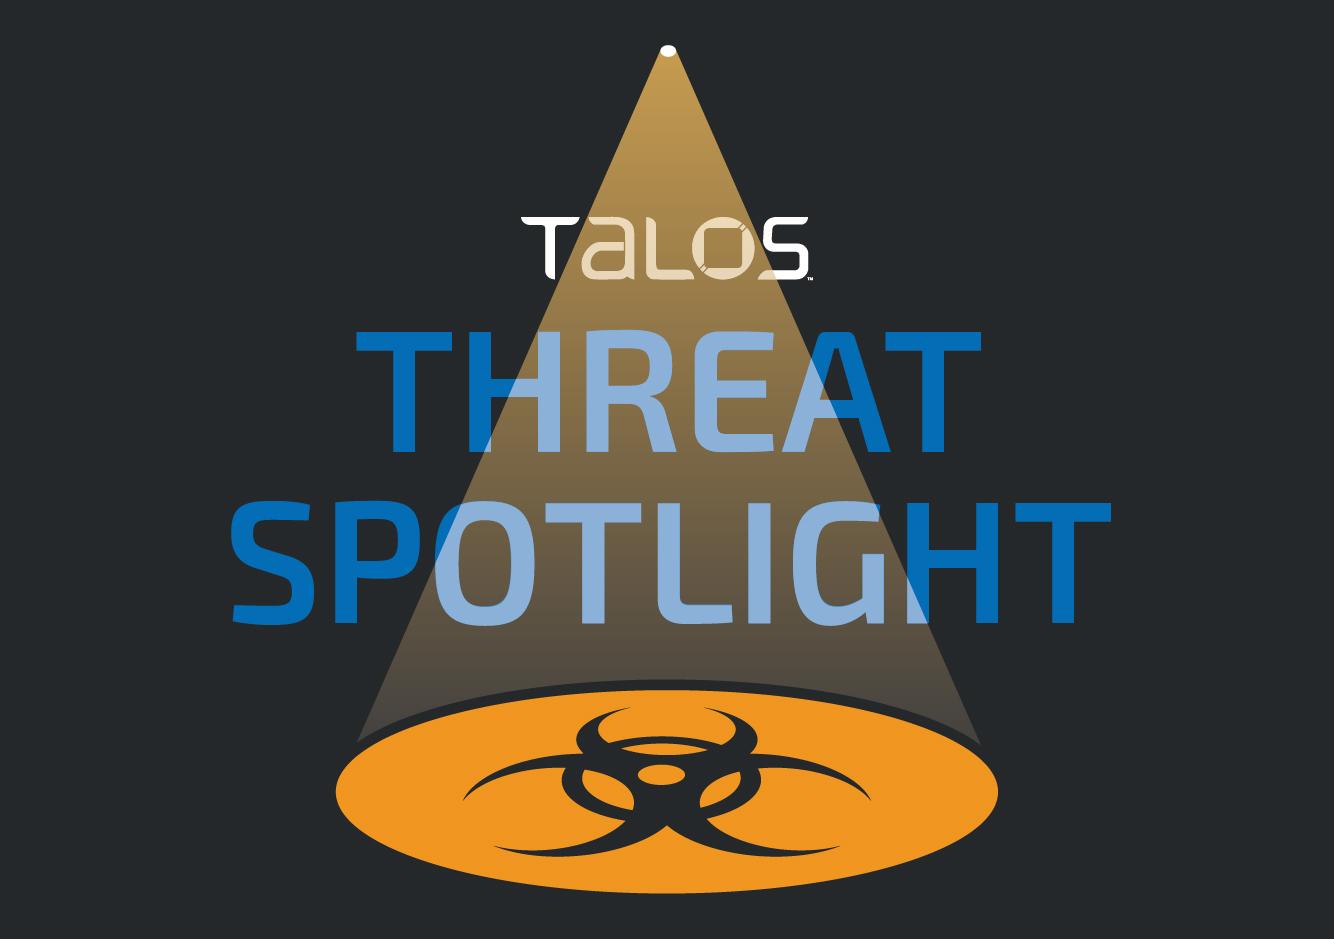 Talos Blog || Cisco Talos Intelligence Group - Comprehensive